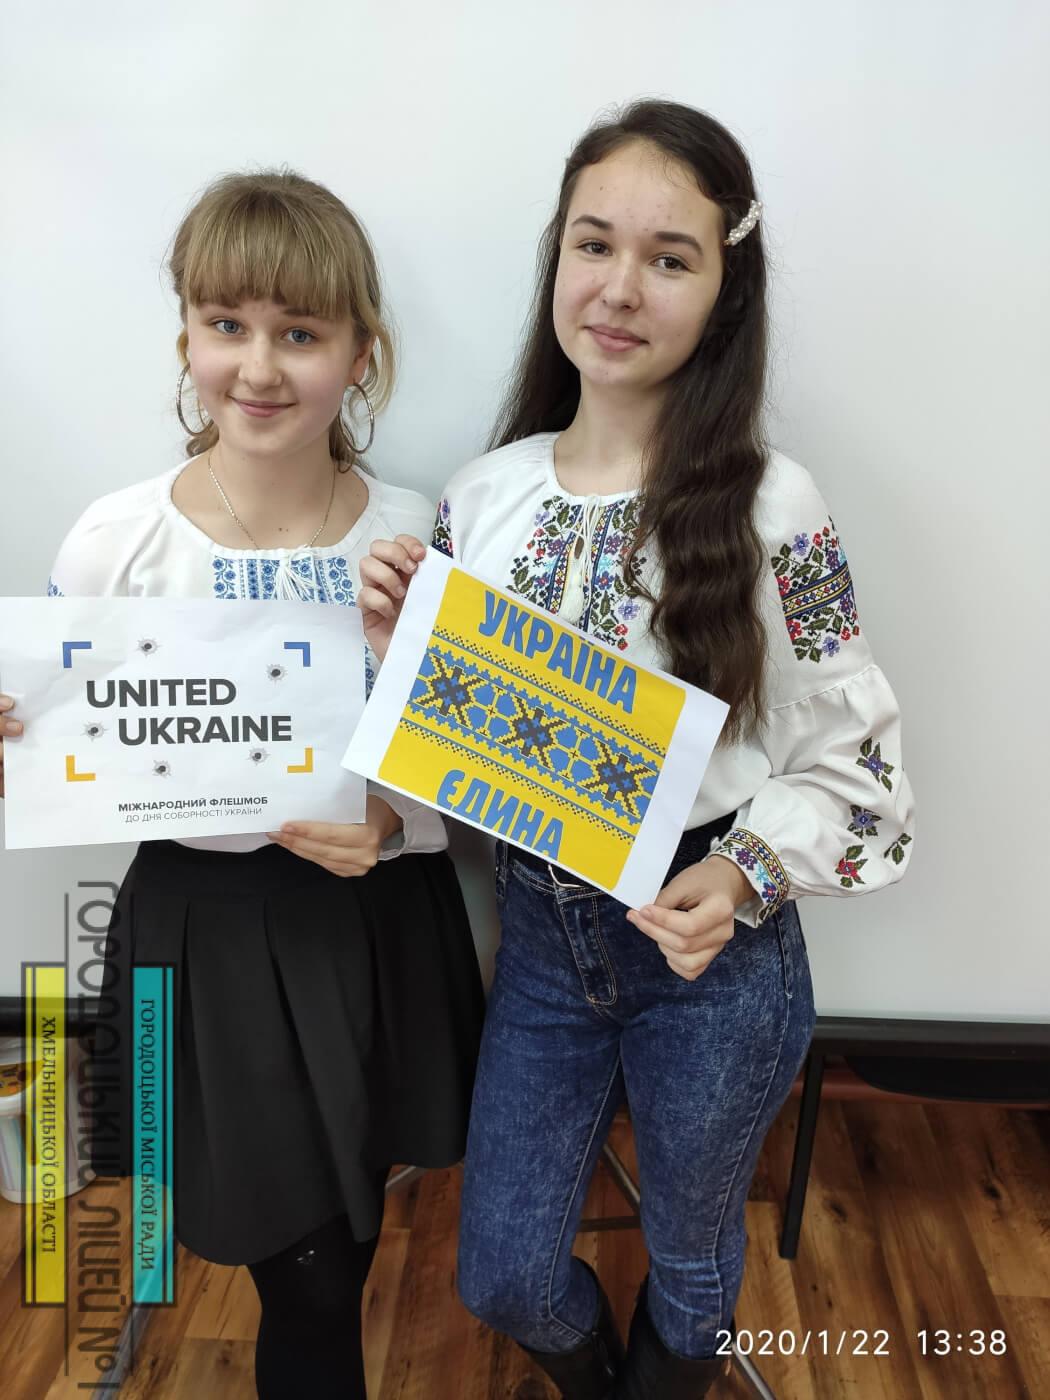 IMG 20200122 133834 e1579705325313 - День Соборності України